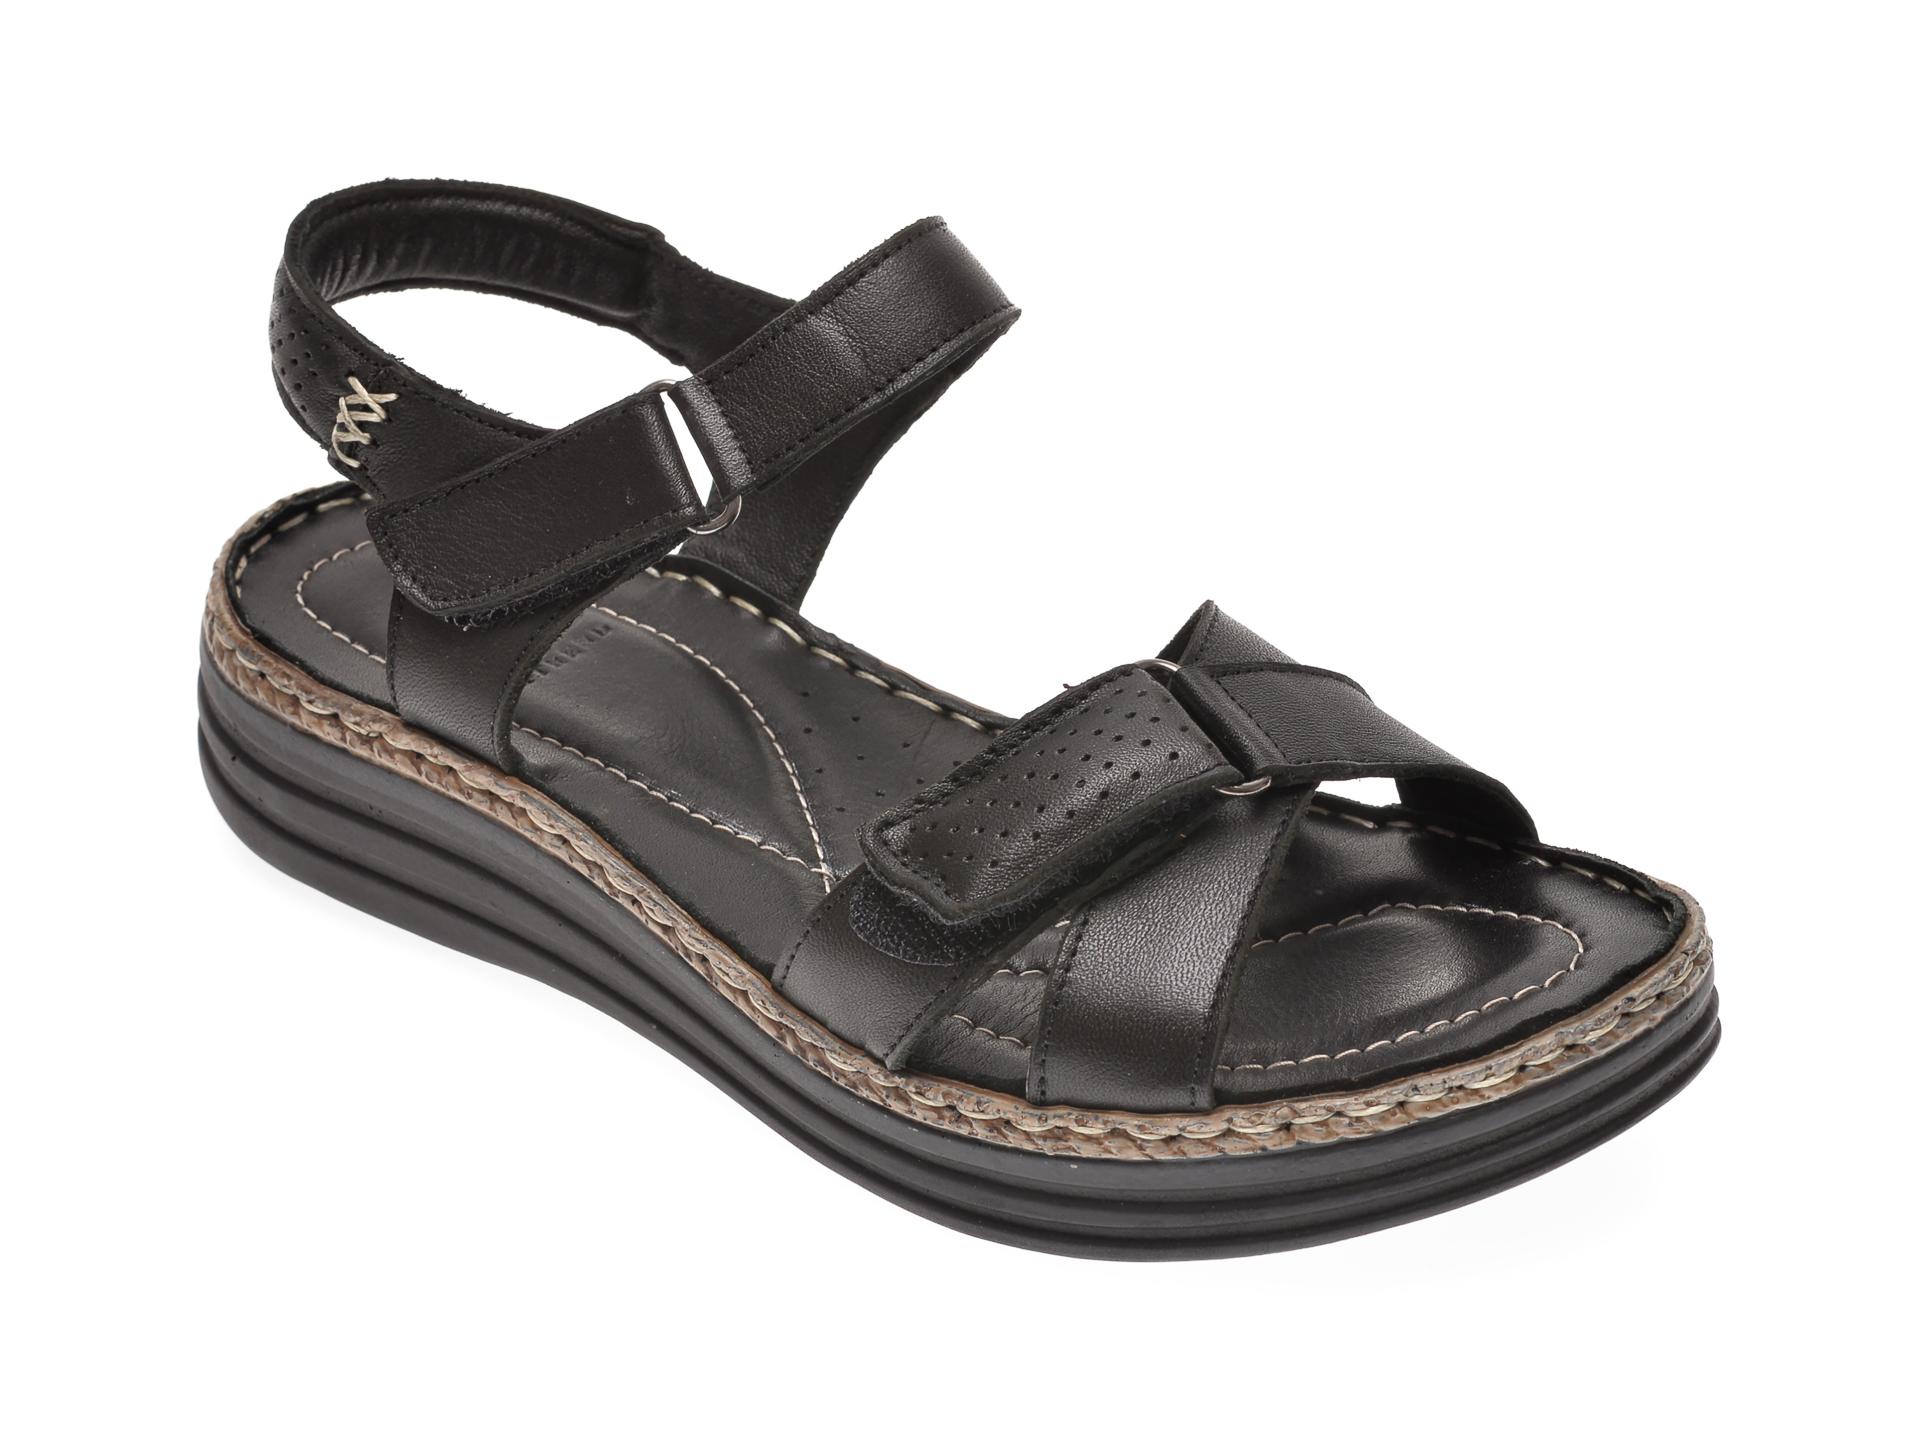 Sandale ON THE ROAD negre, 502, din piele naturala